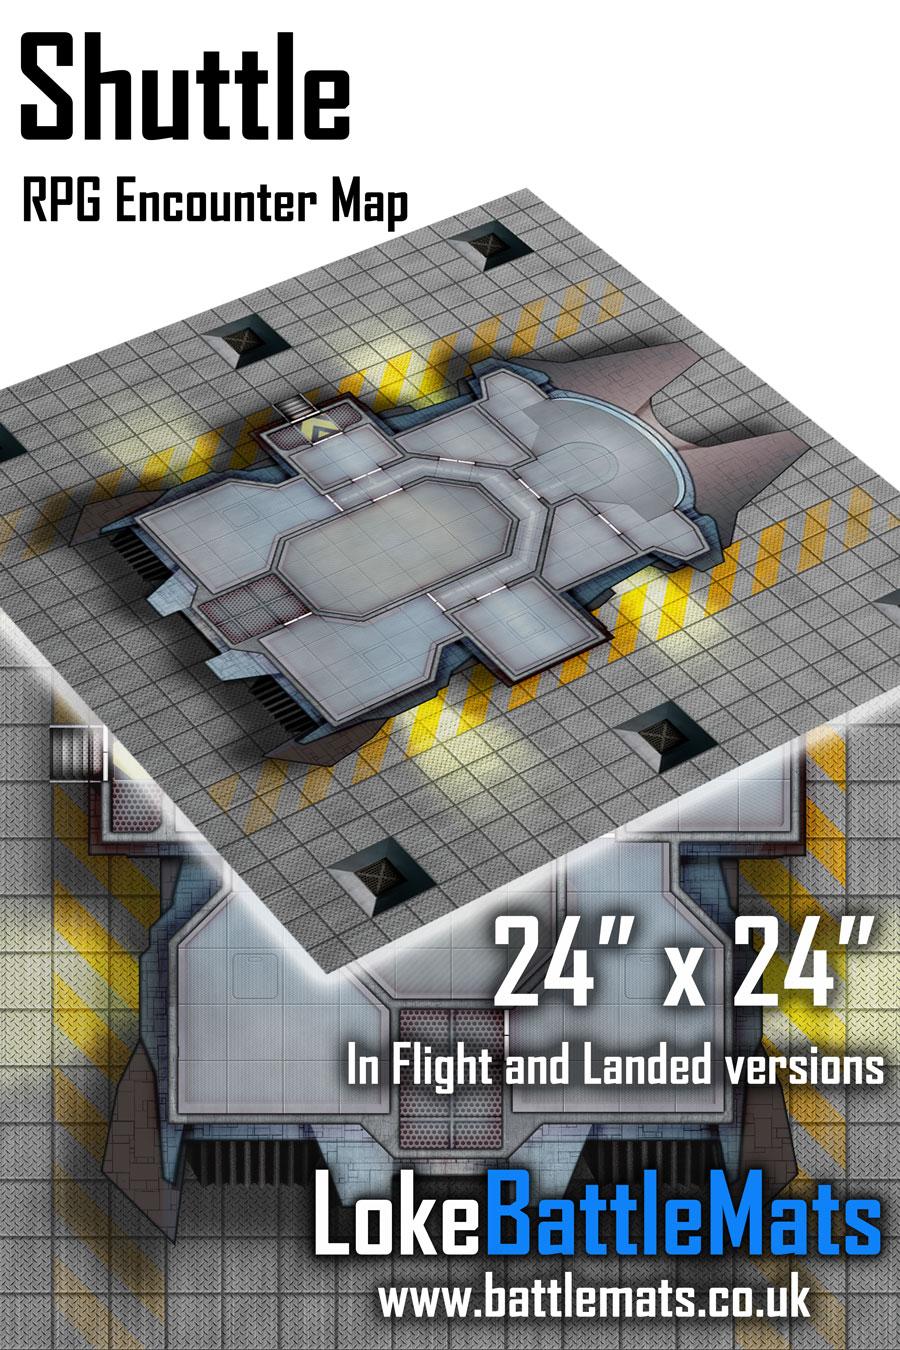 Shuttle-24x24-AD.jpg